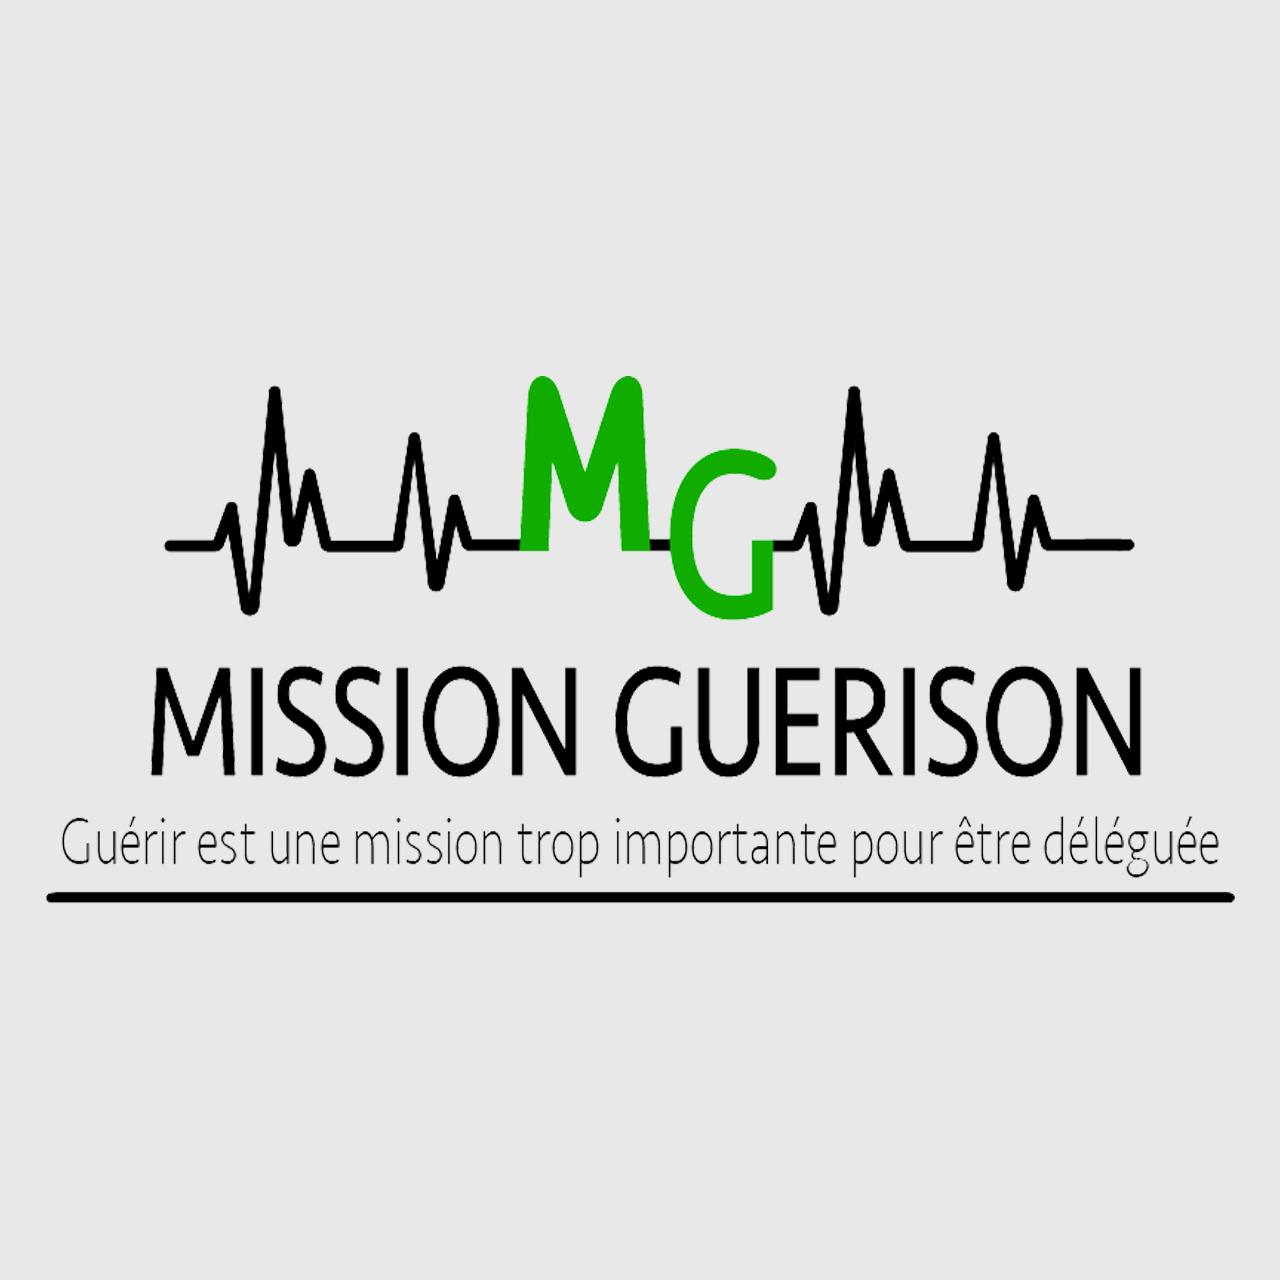 Mission Guérison